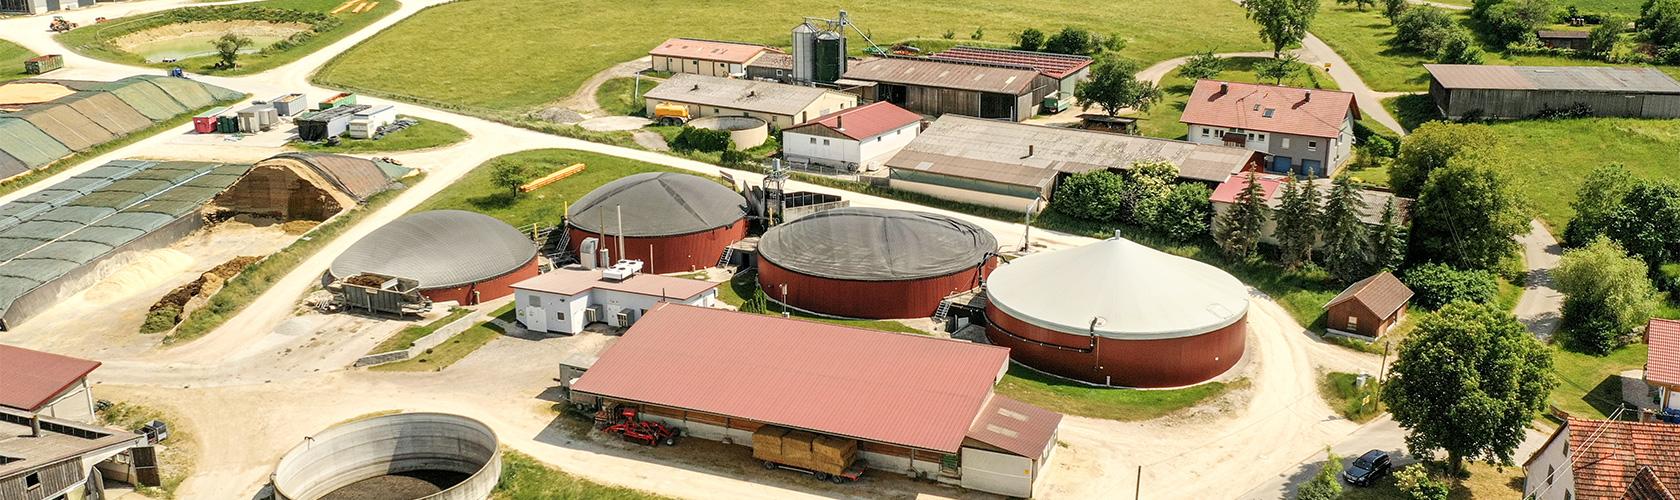 Erdgas bei GEO Energie Ostalb